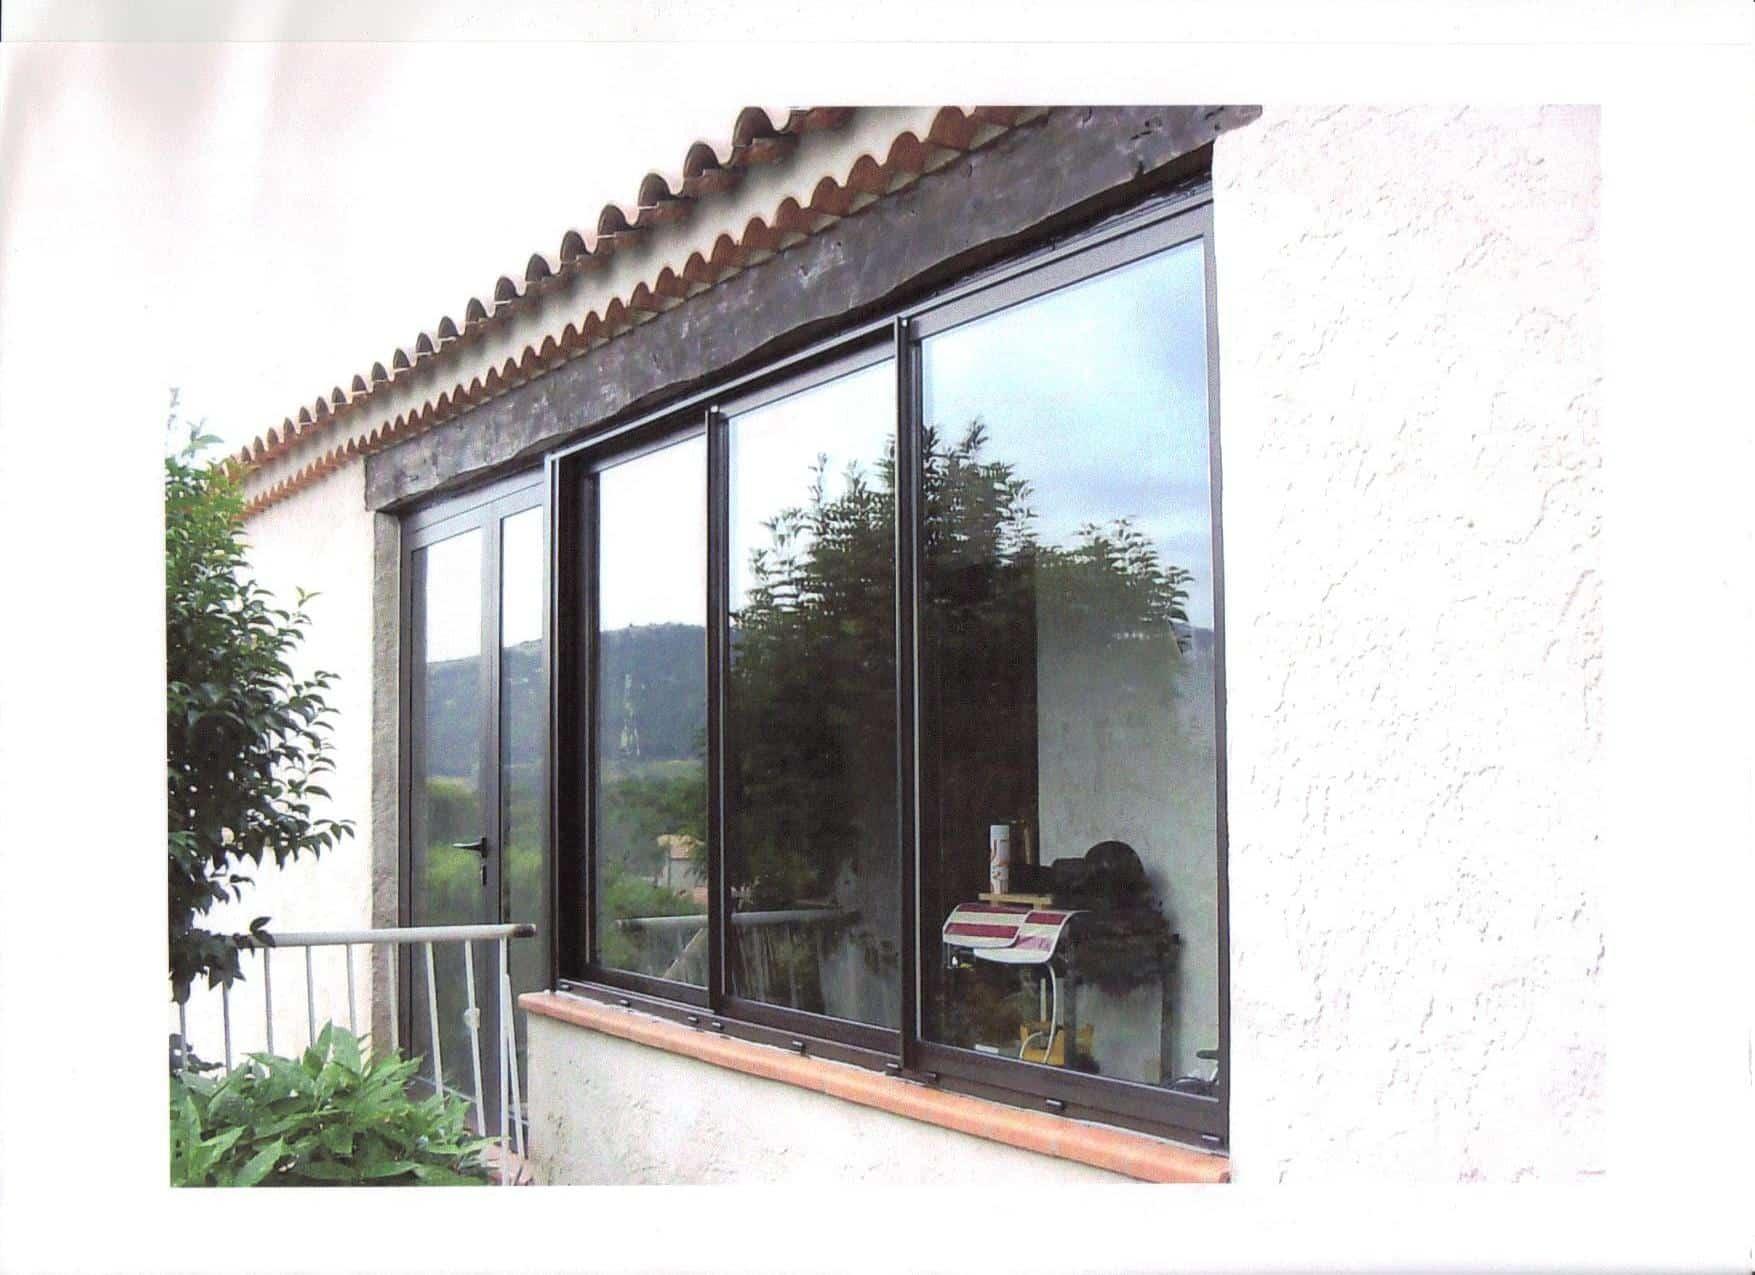 fermeture de terrasse couverte marseille technic habitat. Black Bedroom Furniture Sets. Home Design Ideas